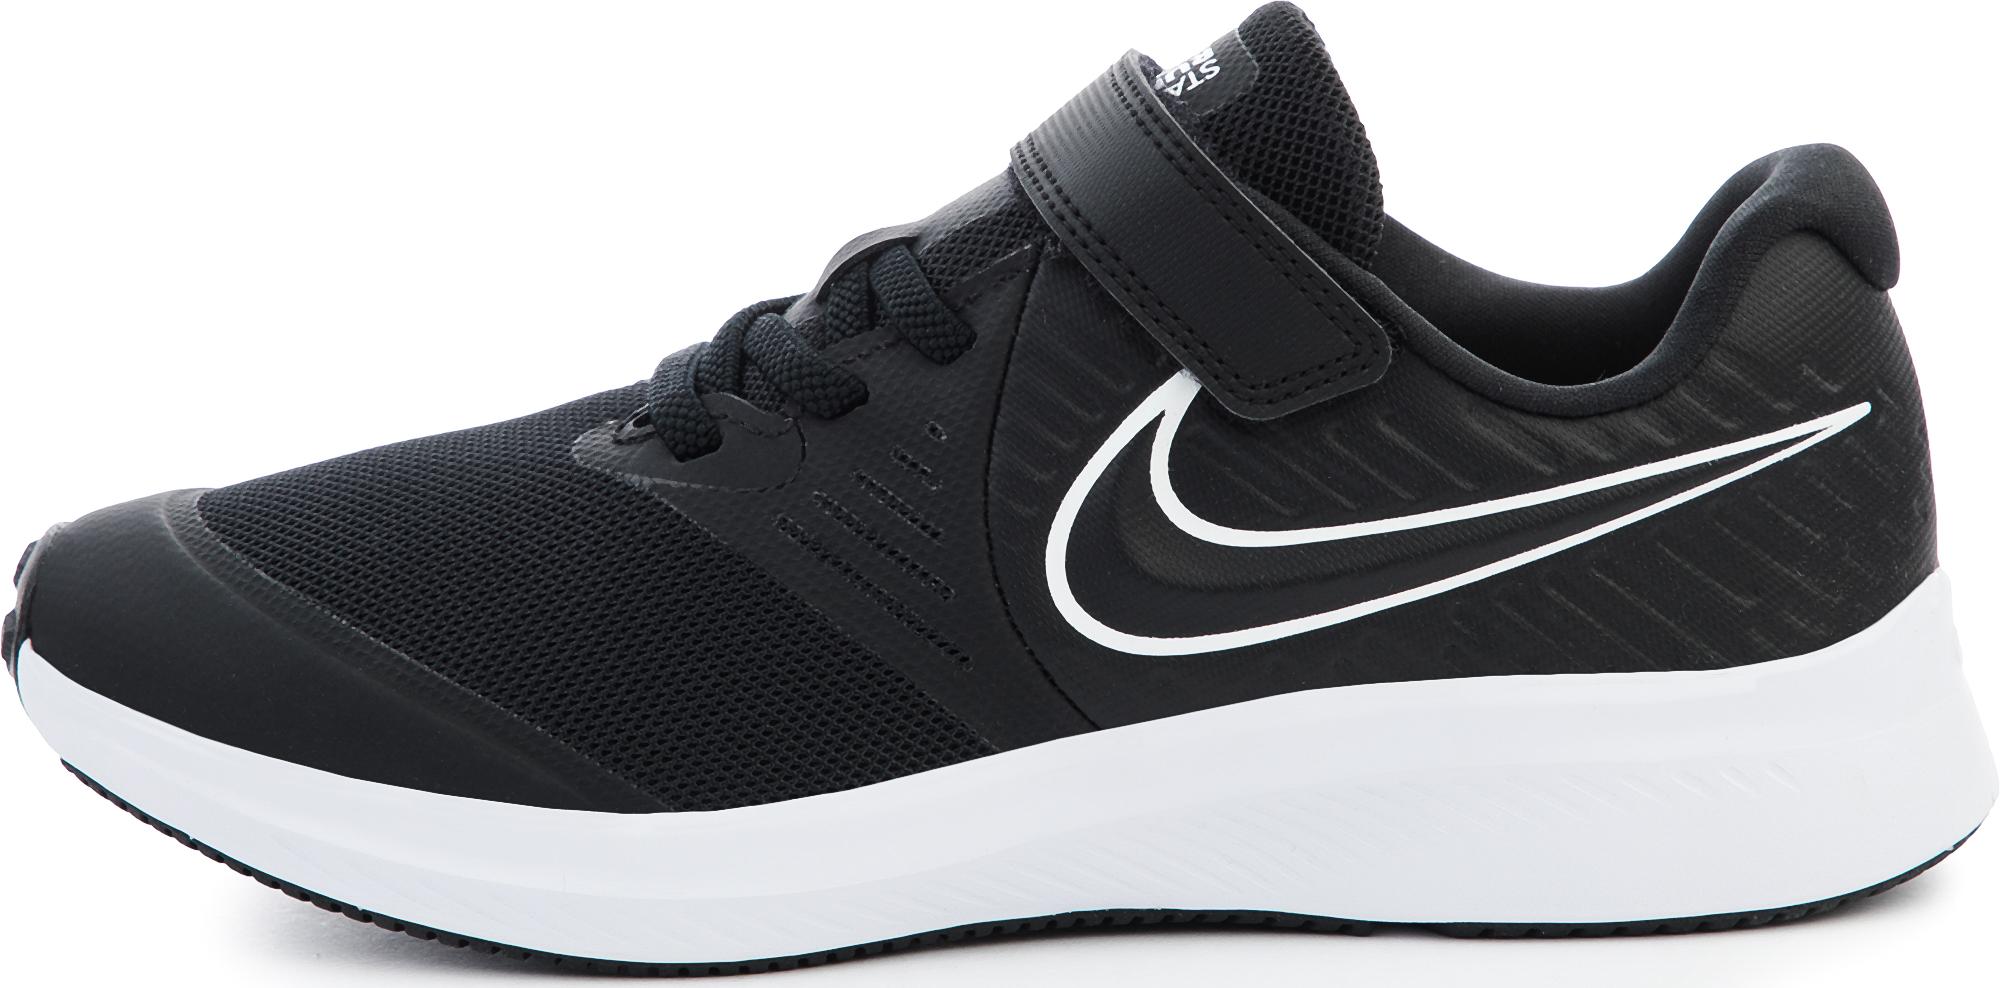 Nike Кроссовки детские Nike Star Runner 2 (Psv), размер 34 цена